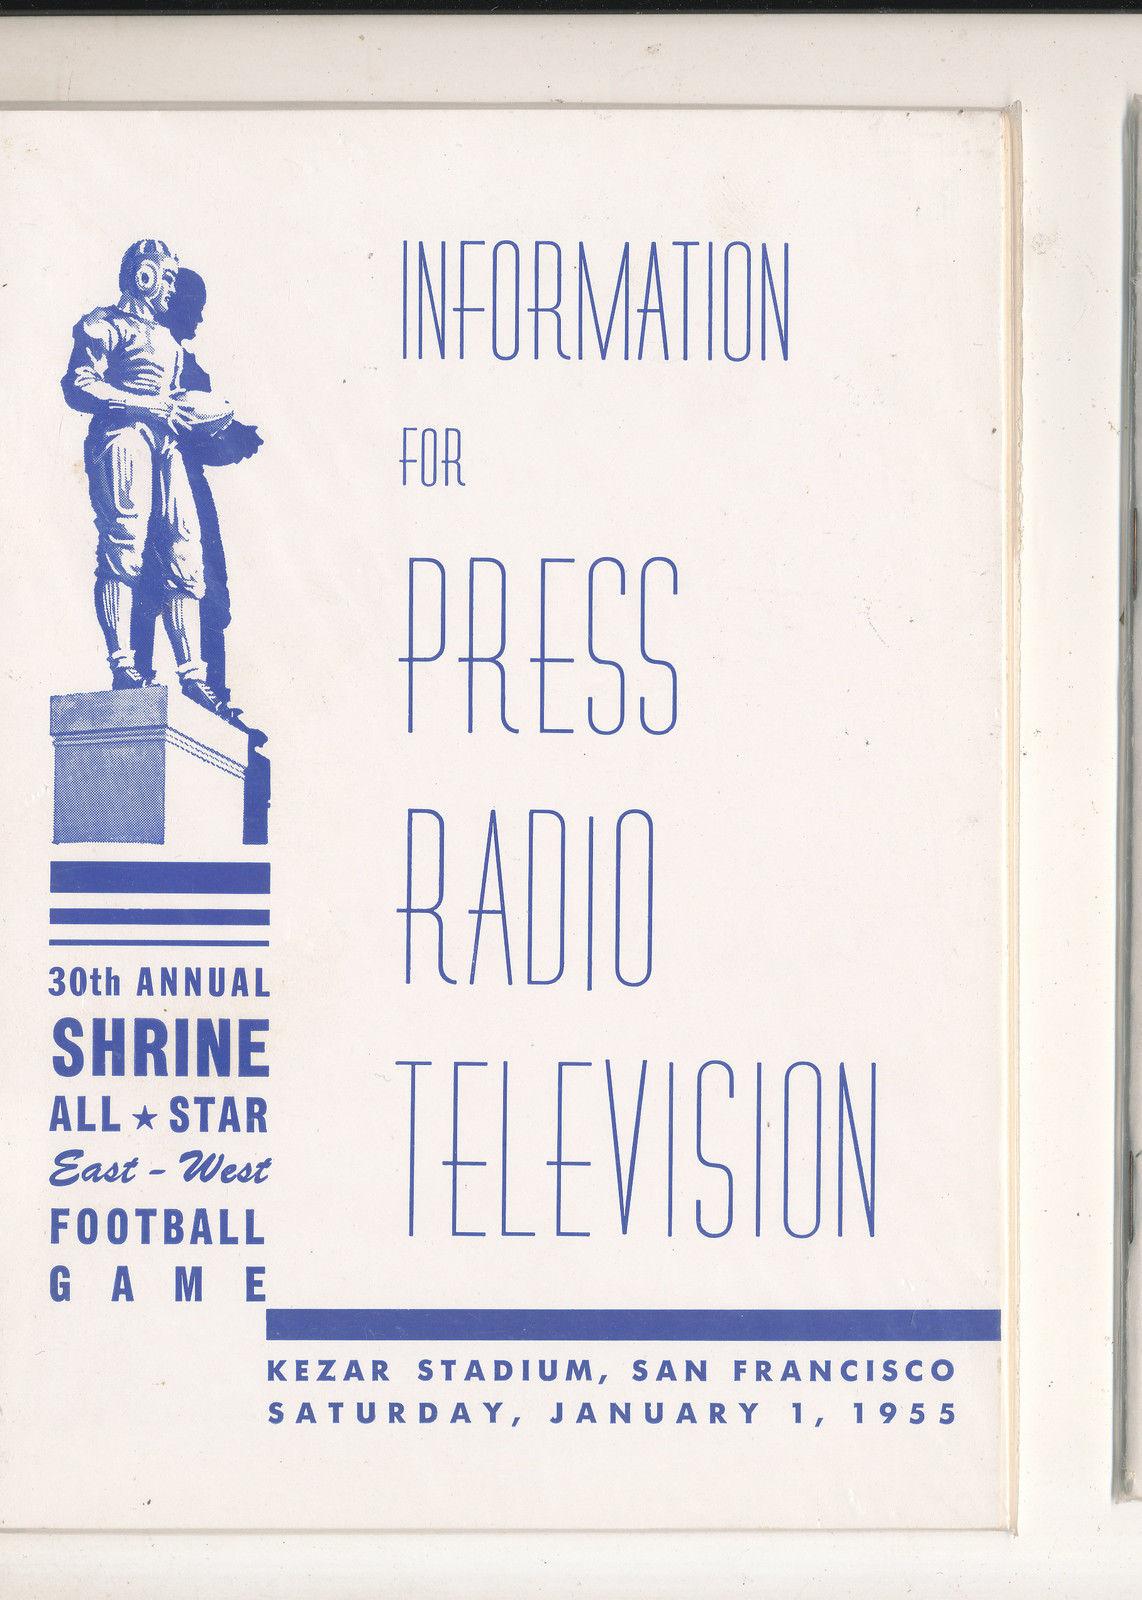 1/2 1955  - 30th Shrine All East West Football Bowl media press radio tv guide